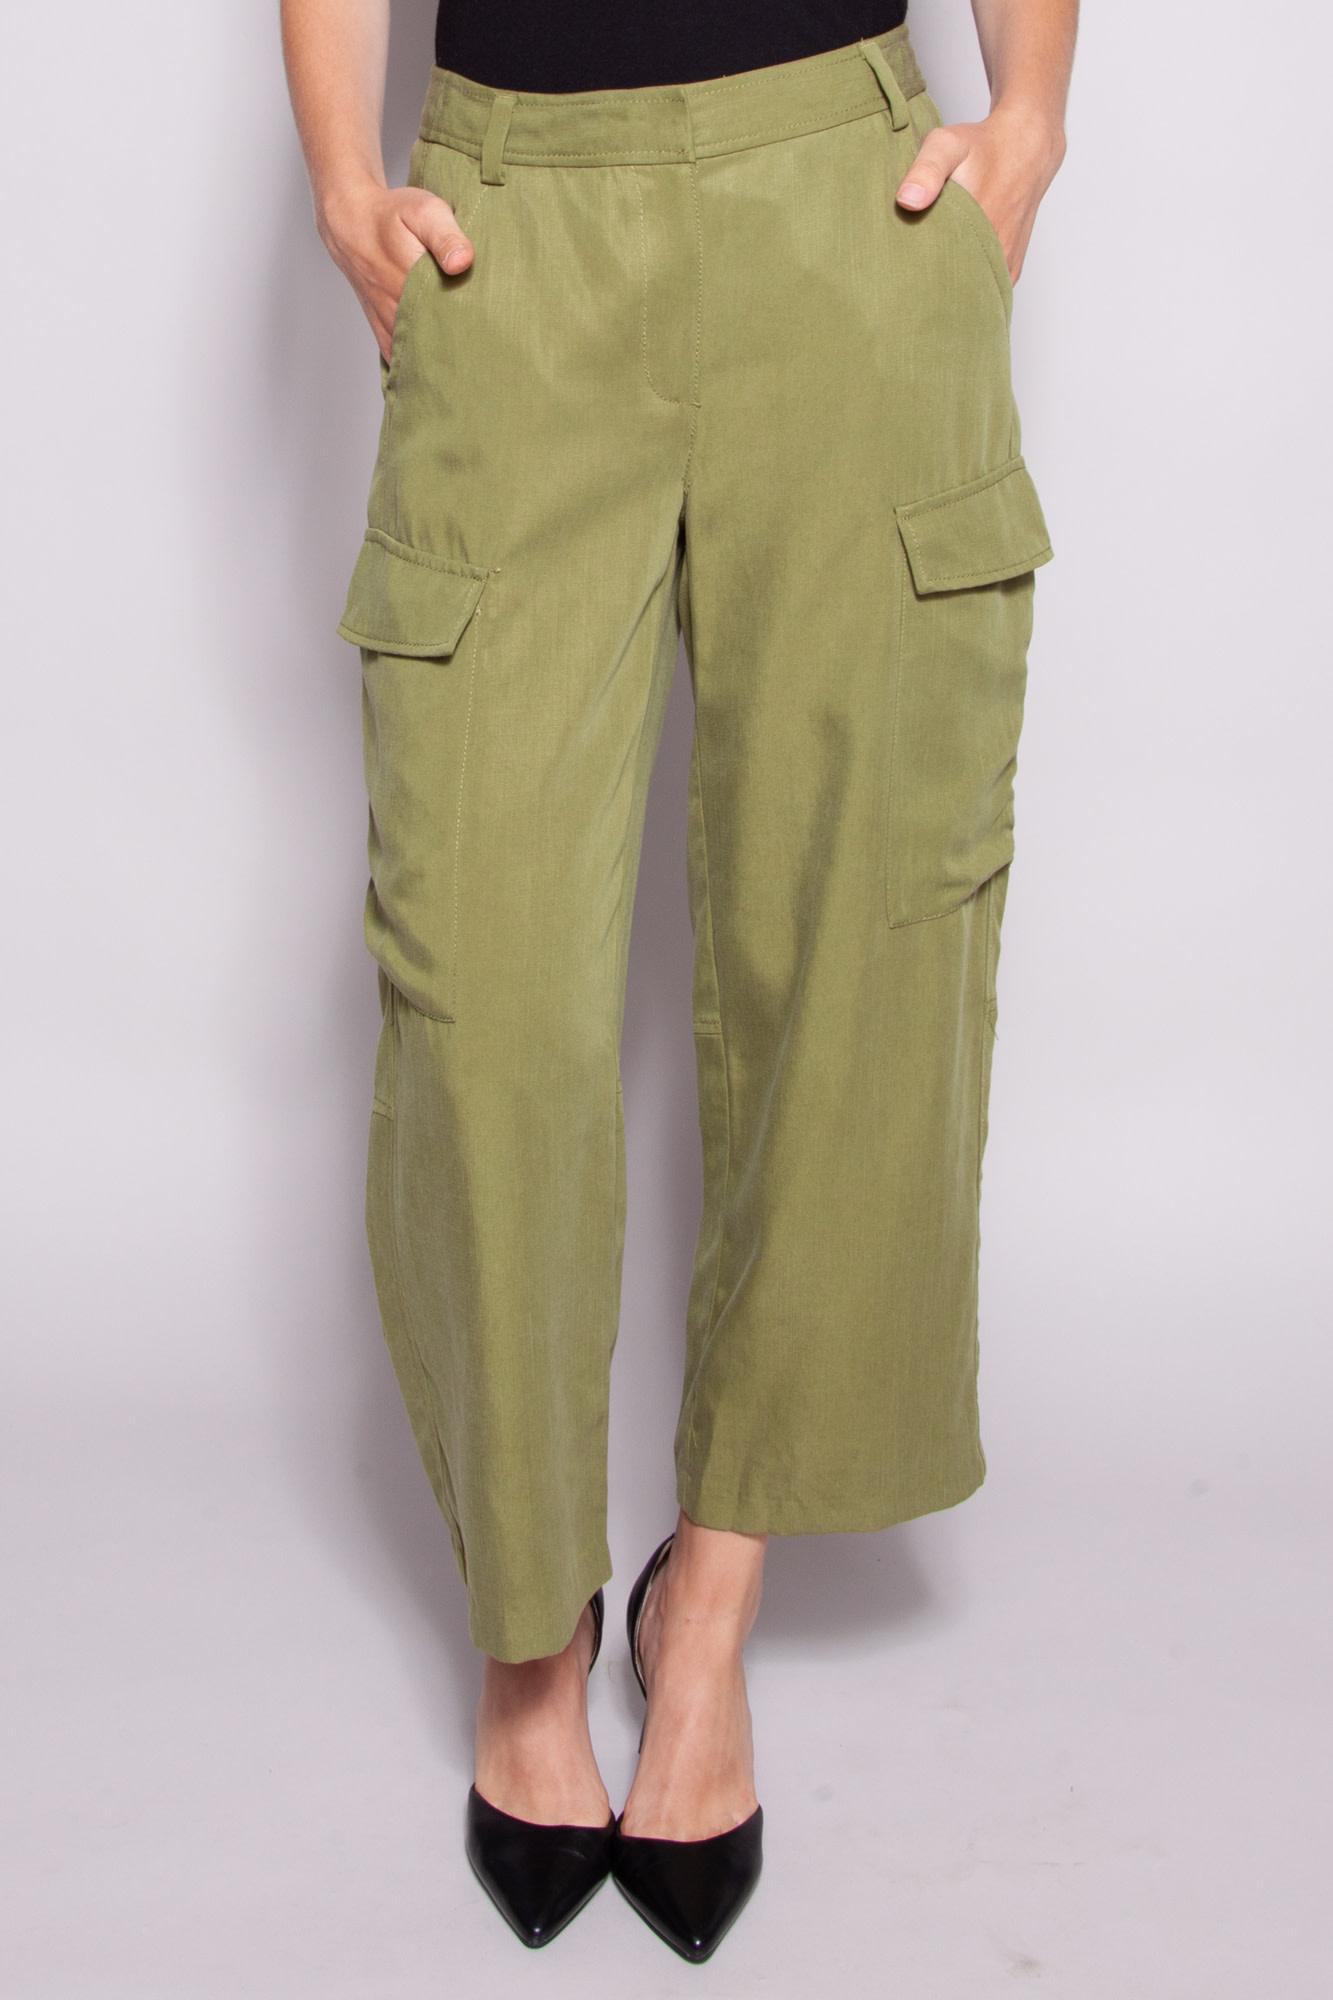 MICHAEL Michael Kors GREEN CARGO PANTS